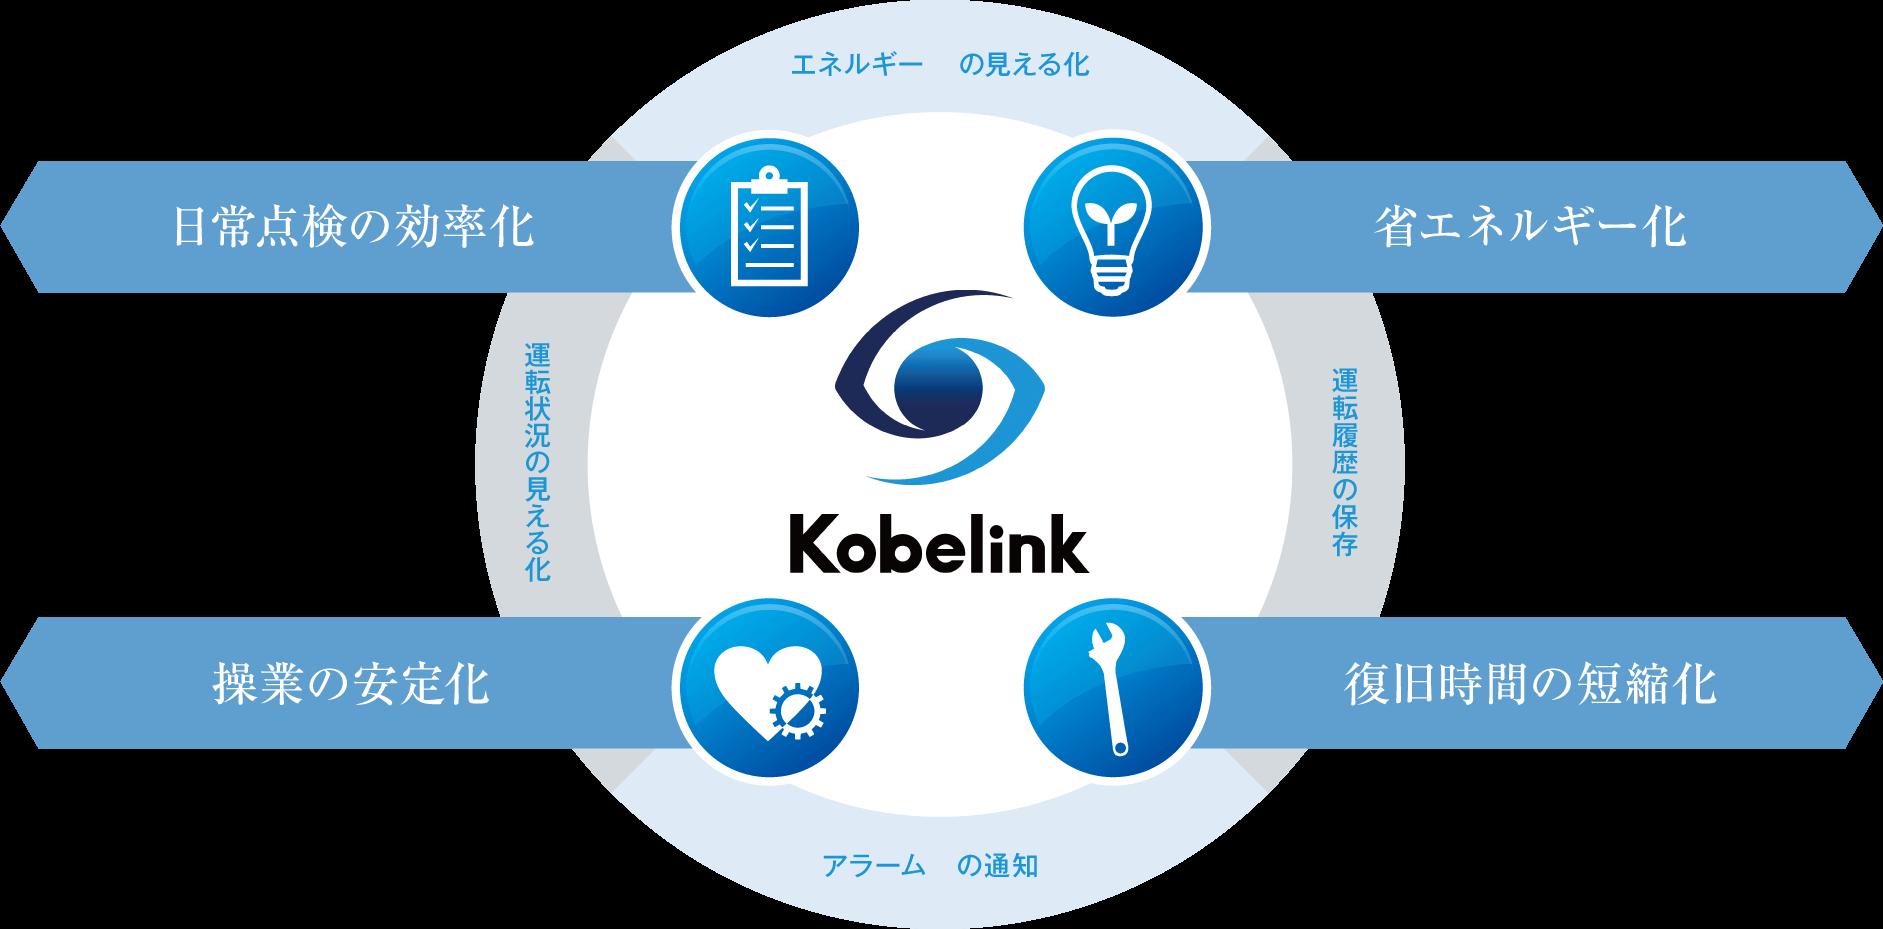 Kobelink四大メリット図